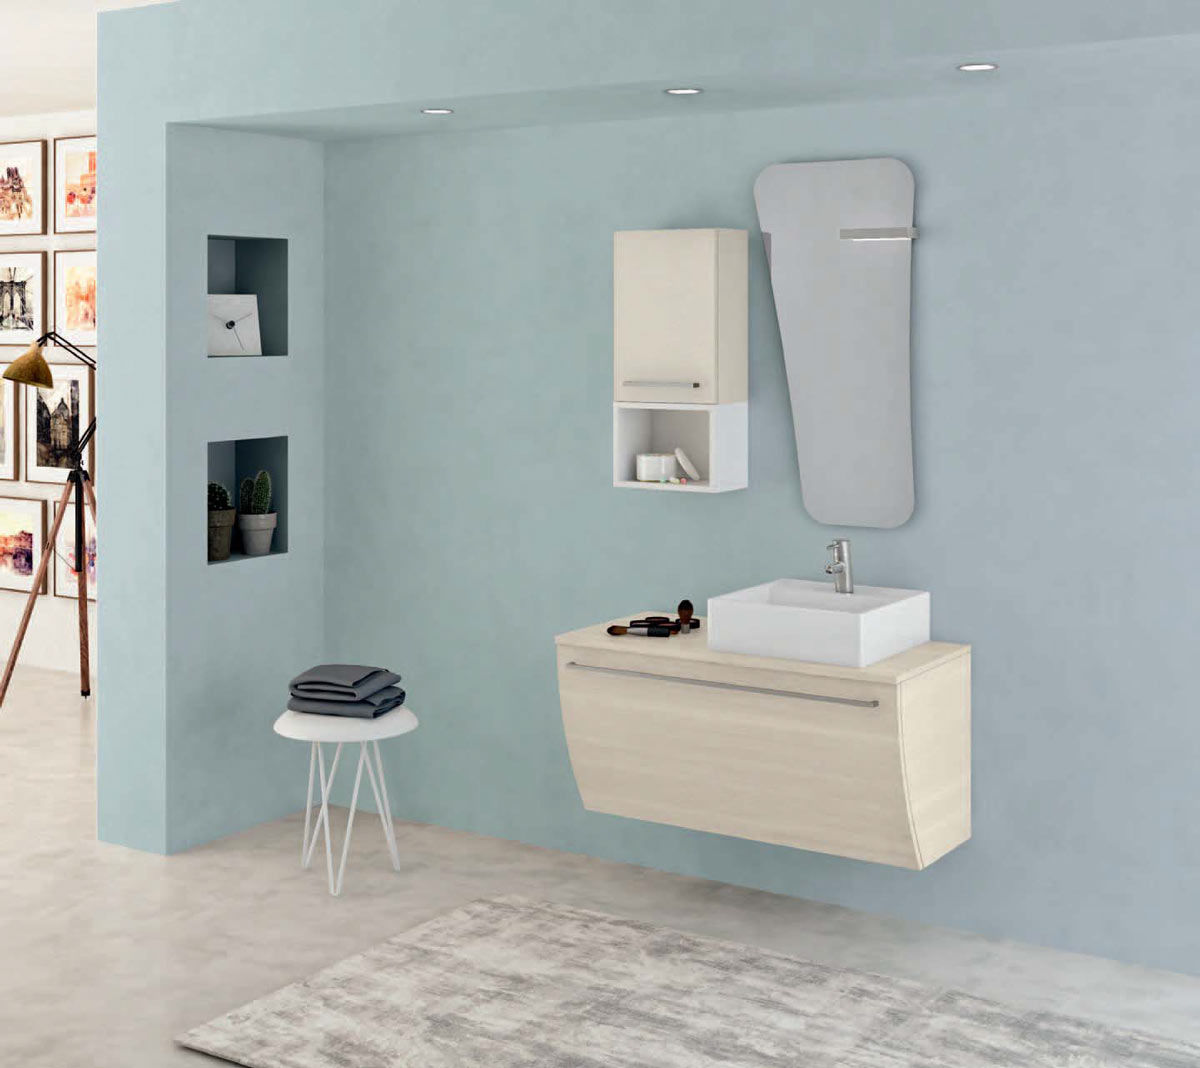 Emejing arredo bagno moderno offerte pictures for Offerte arredo bagno